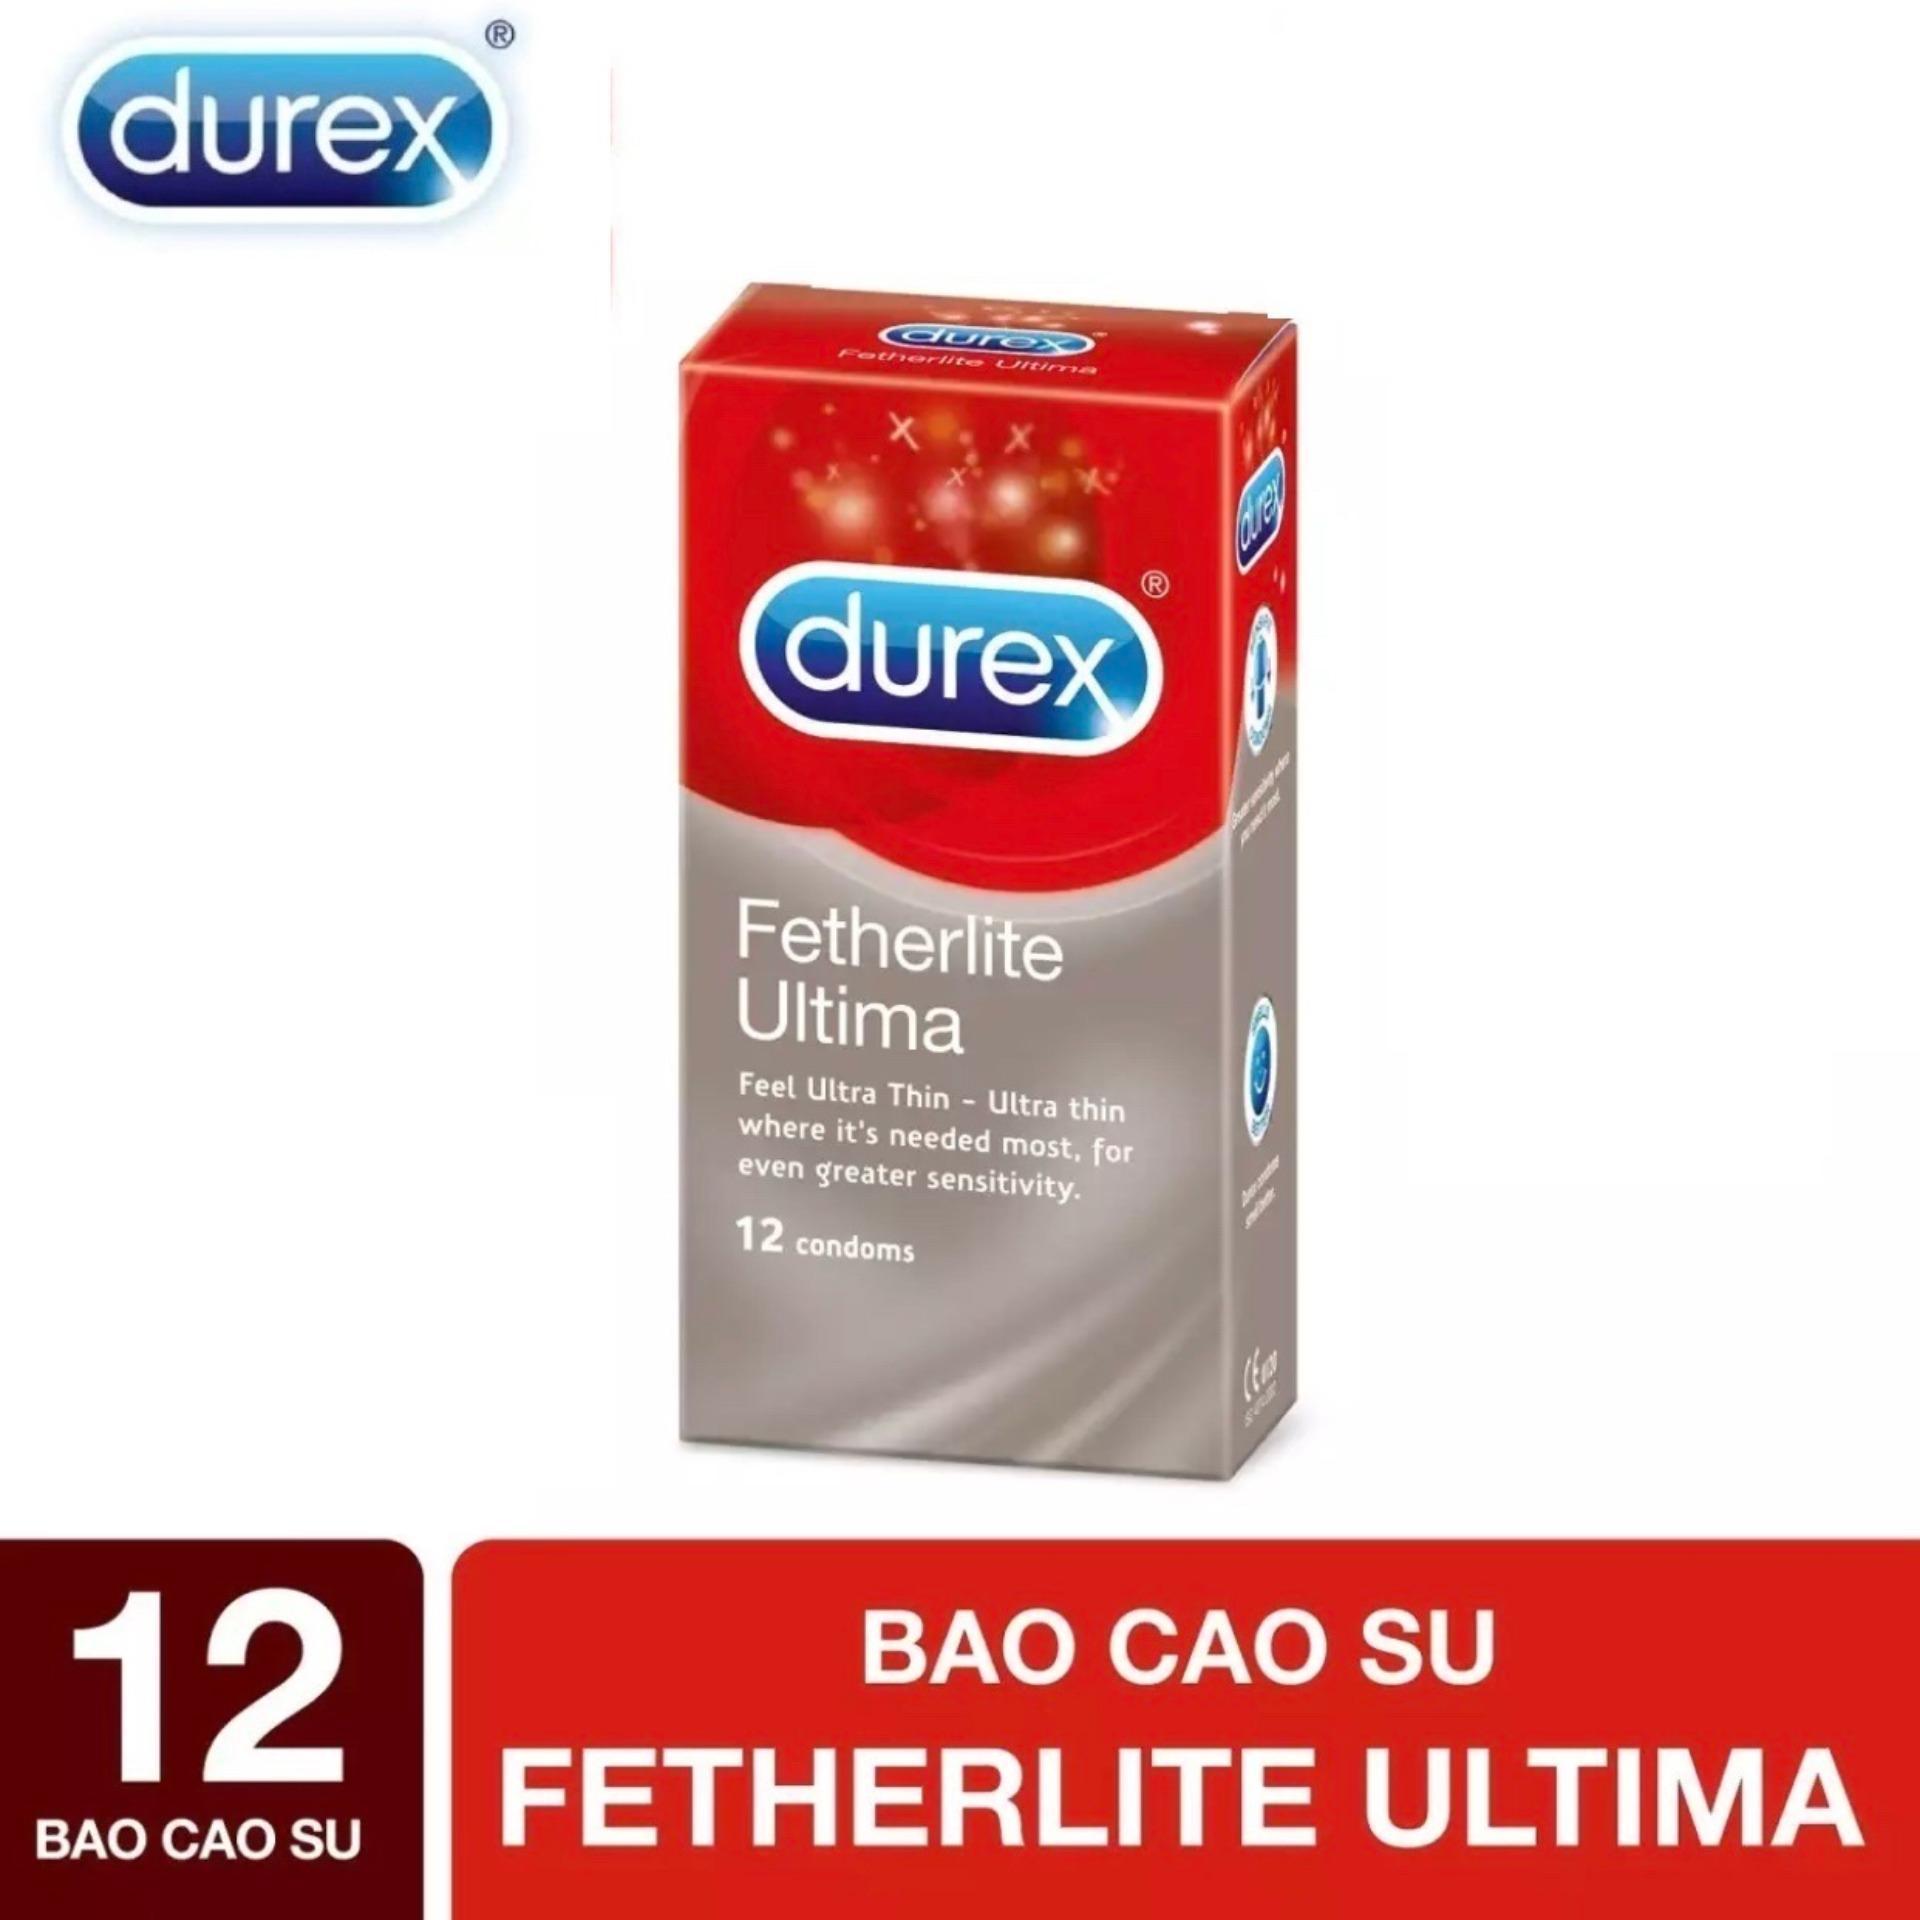 Bao cao su Durex Fetherlite Ultima siêu mỏng 12s [che tên sản phẩm]